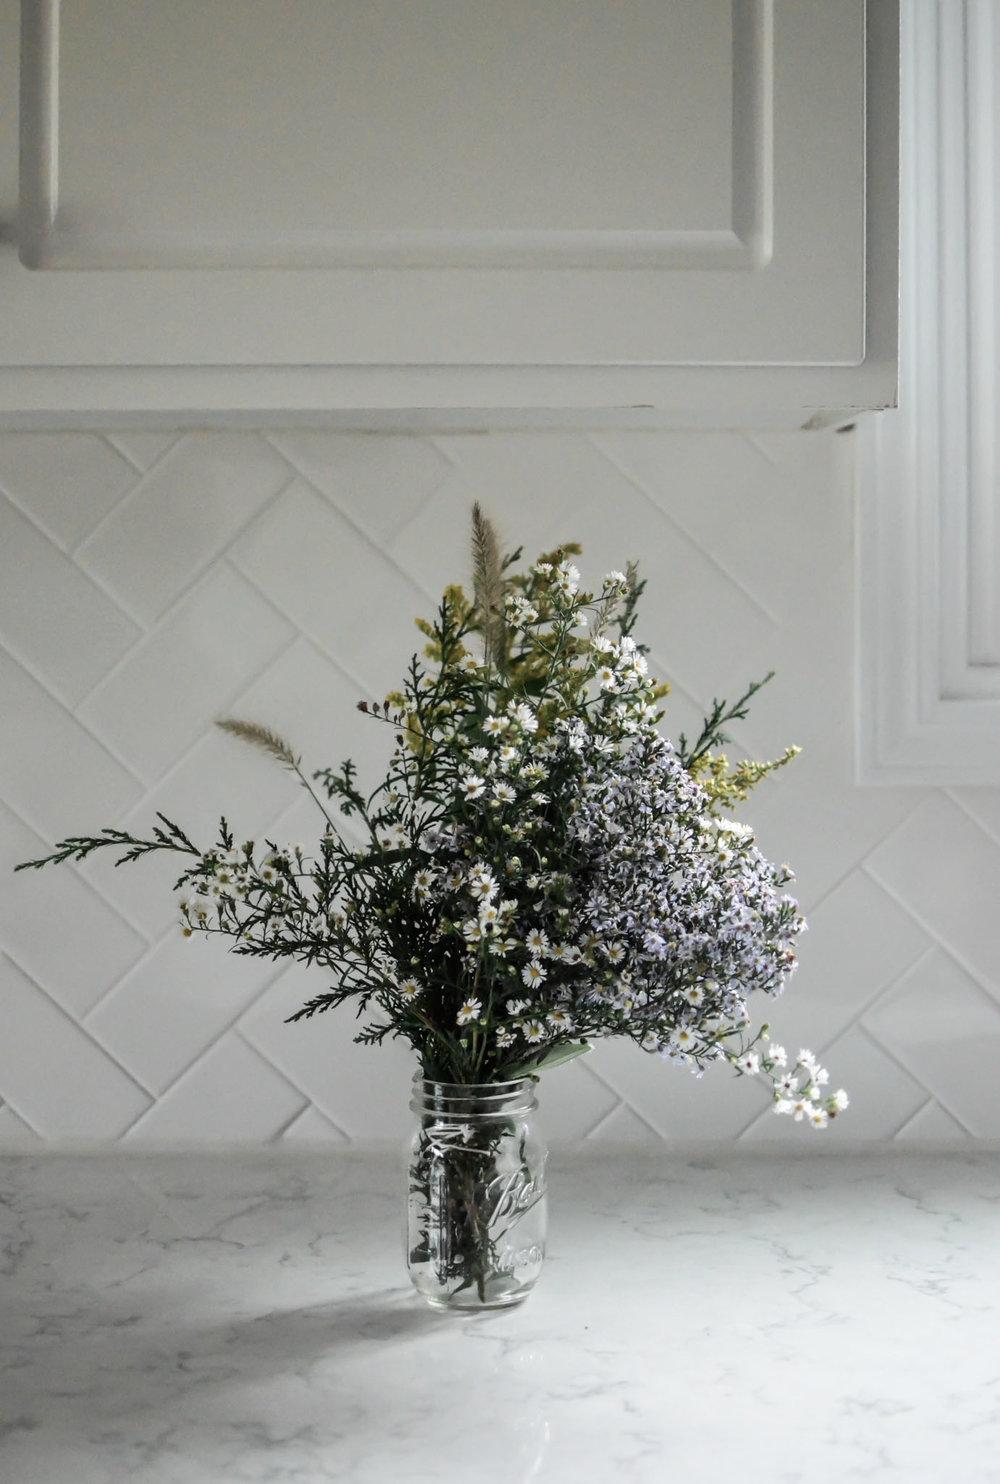 Wendling_Boyd__Wild_Flowers-3.jpg